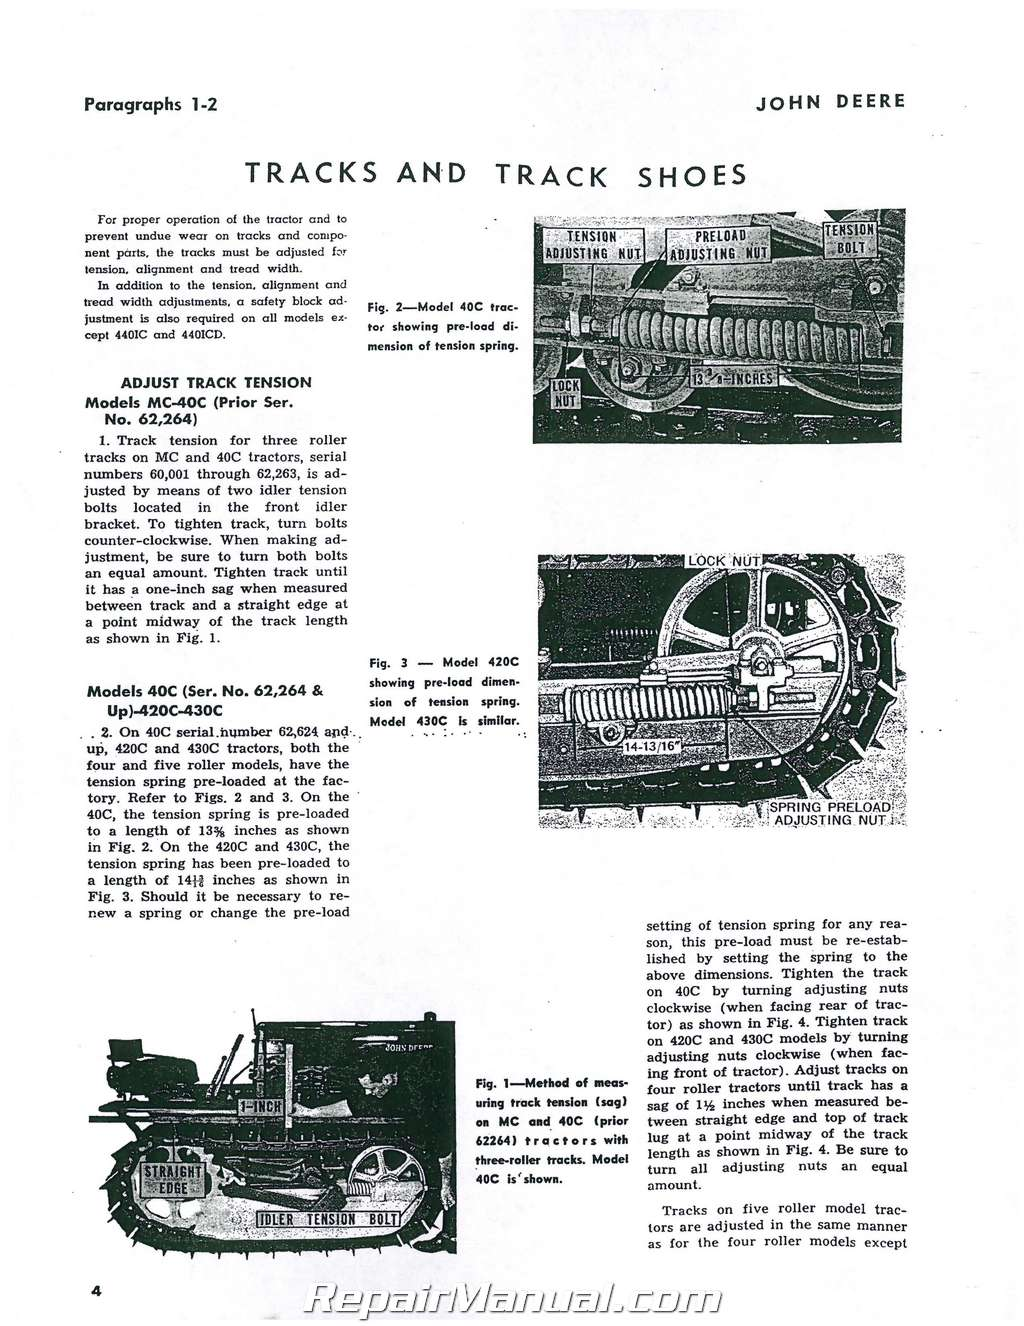 john deere mc 40c 420c 430c 4401c 4401cd crawler service manual rh repairmanual com John Deere 420 John Deere 430C